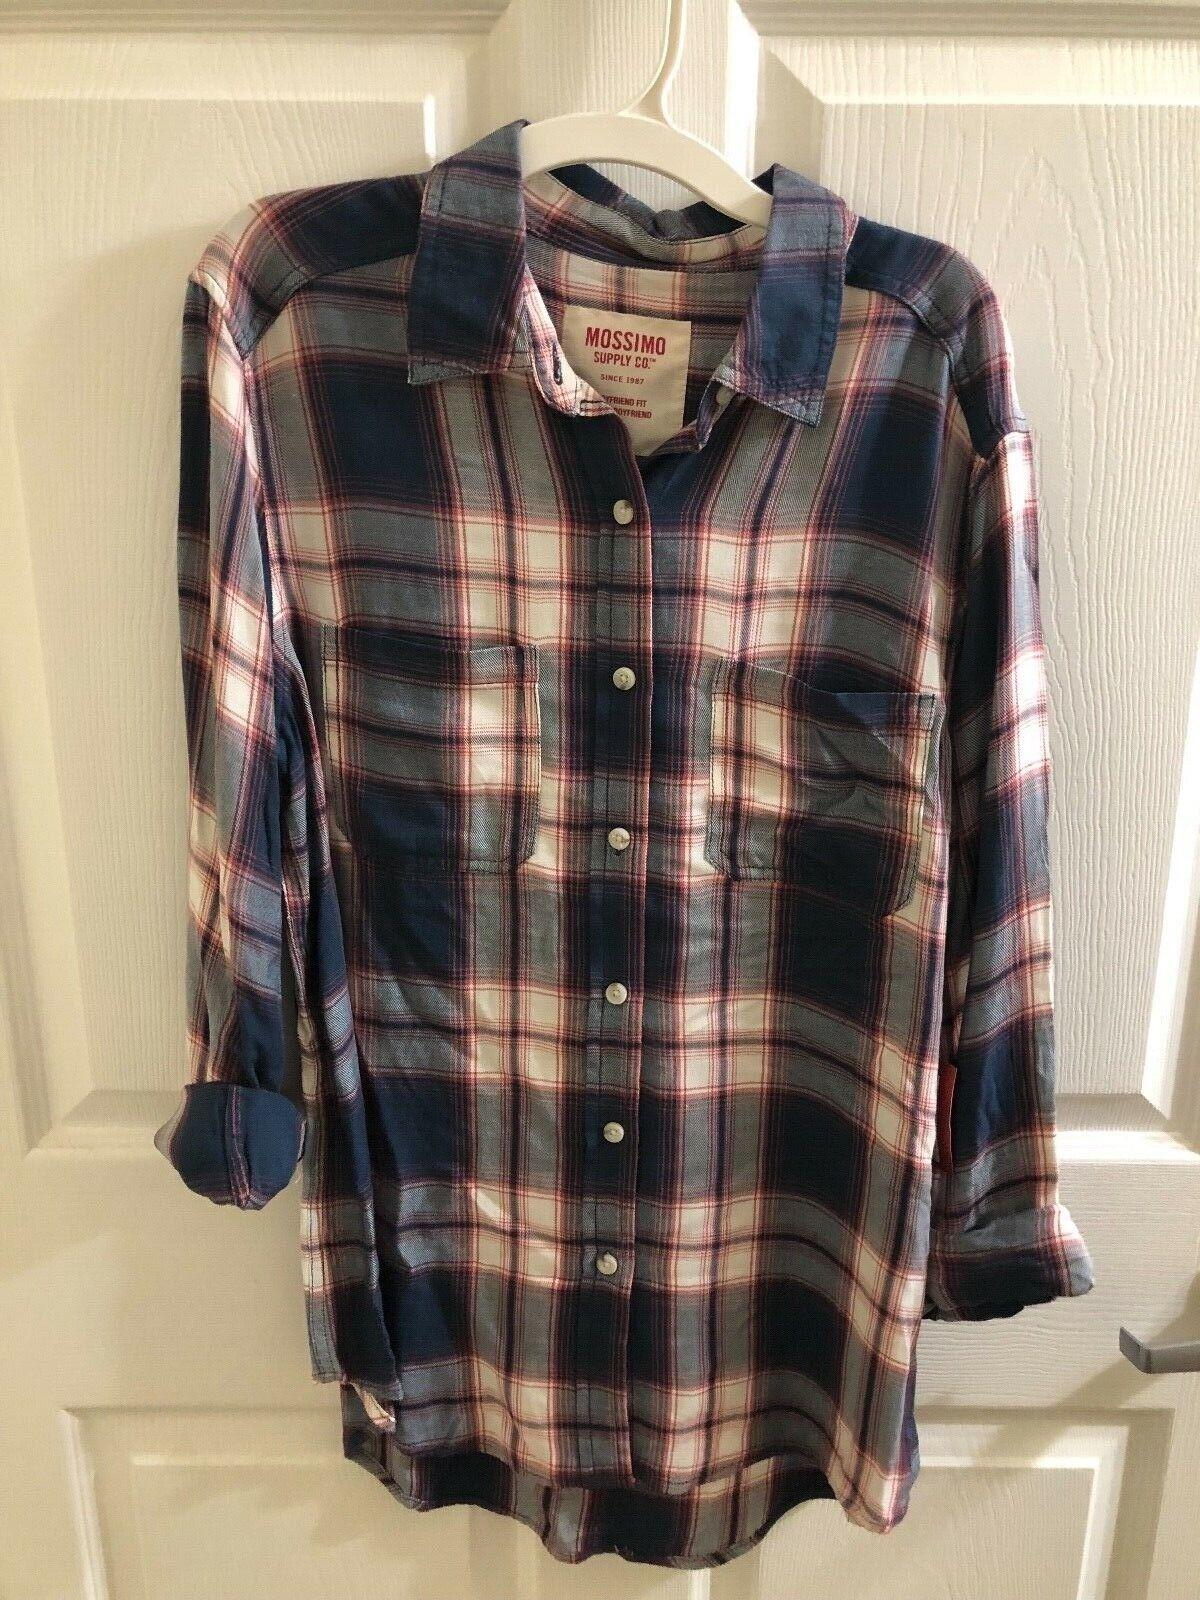 Mossimo Supply Co - Women's Navy Flannel Shirt - Boyfriend F